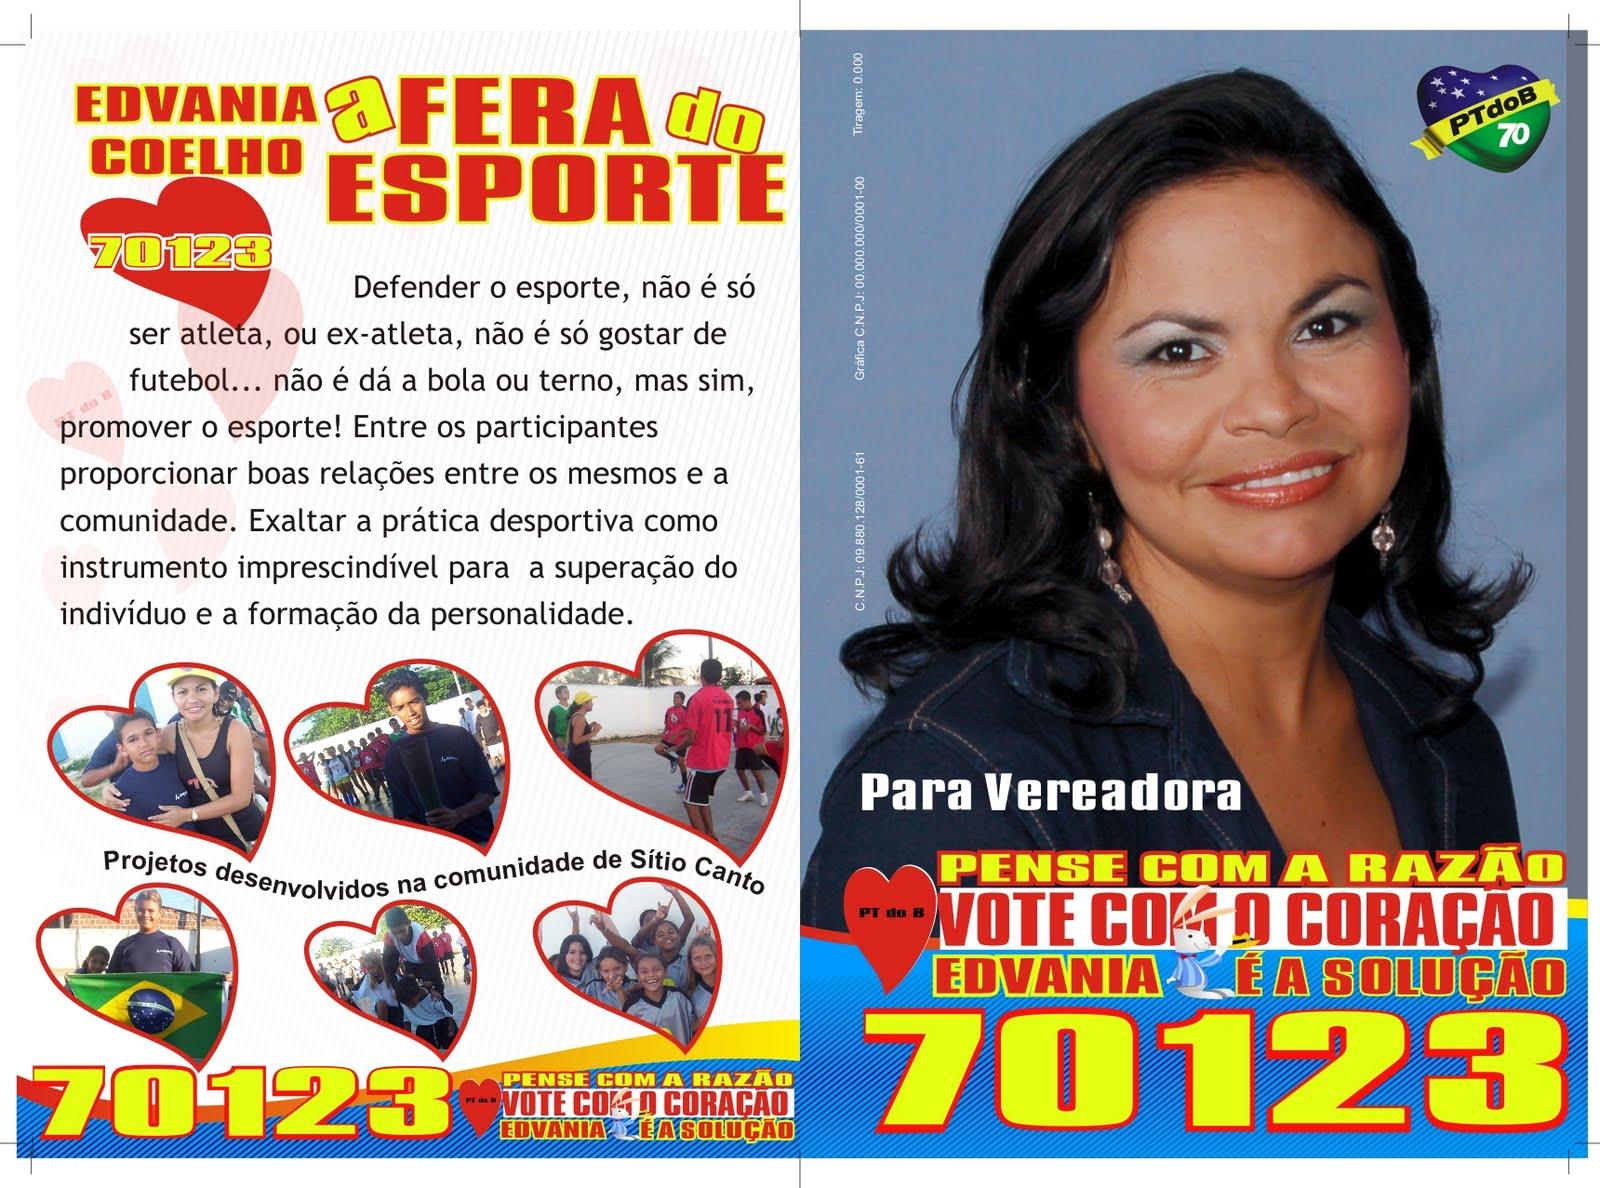 http://1.bp.blogspot.com/-NpnWmDyQuAc/TbgGizneRsI/AAAAAAAAACw/WyZVoVUJ524/s1600/Cartilha_Edv%2525C3%2525A2nia%2BCo%2525C3%2525AAlho_frente.jpg